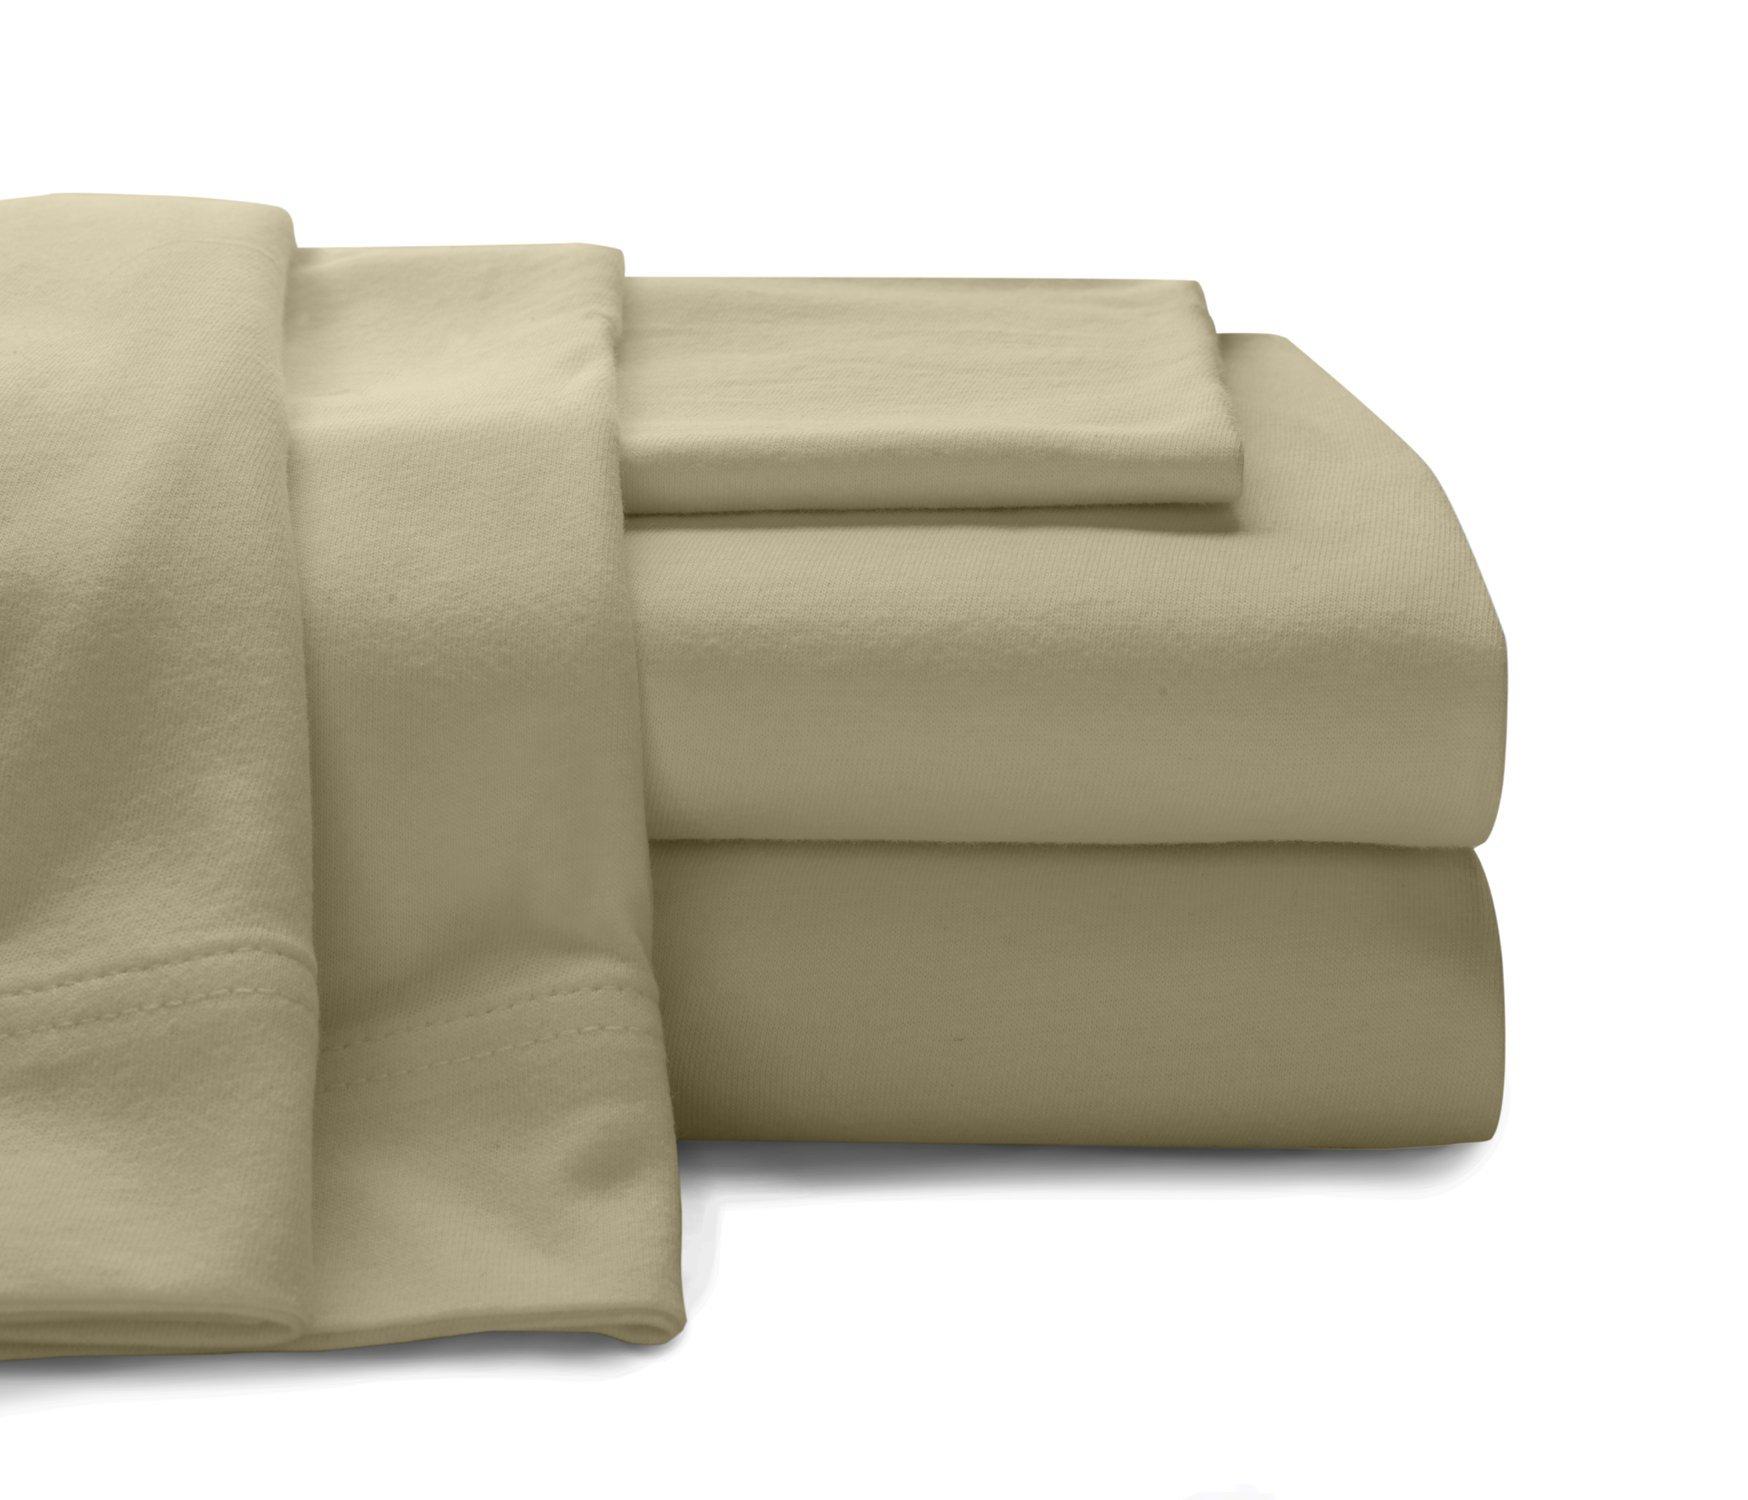 Baltic Linen Company Cotton Jersey Sheet Set Twin Taupe